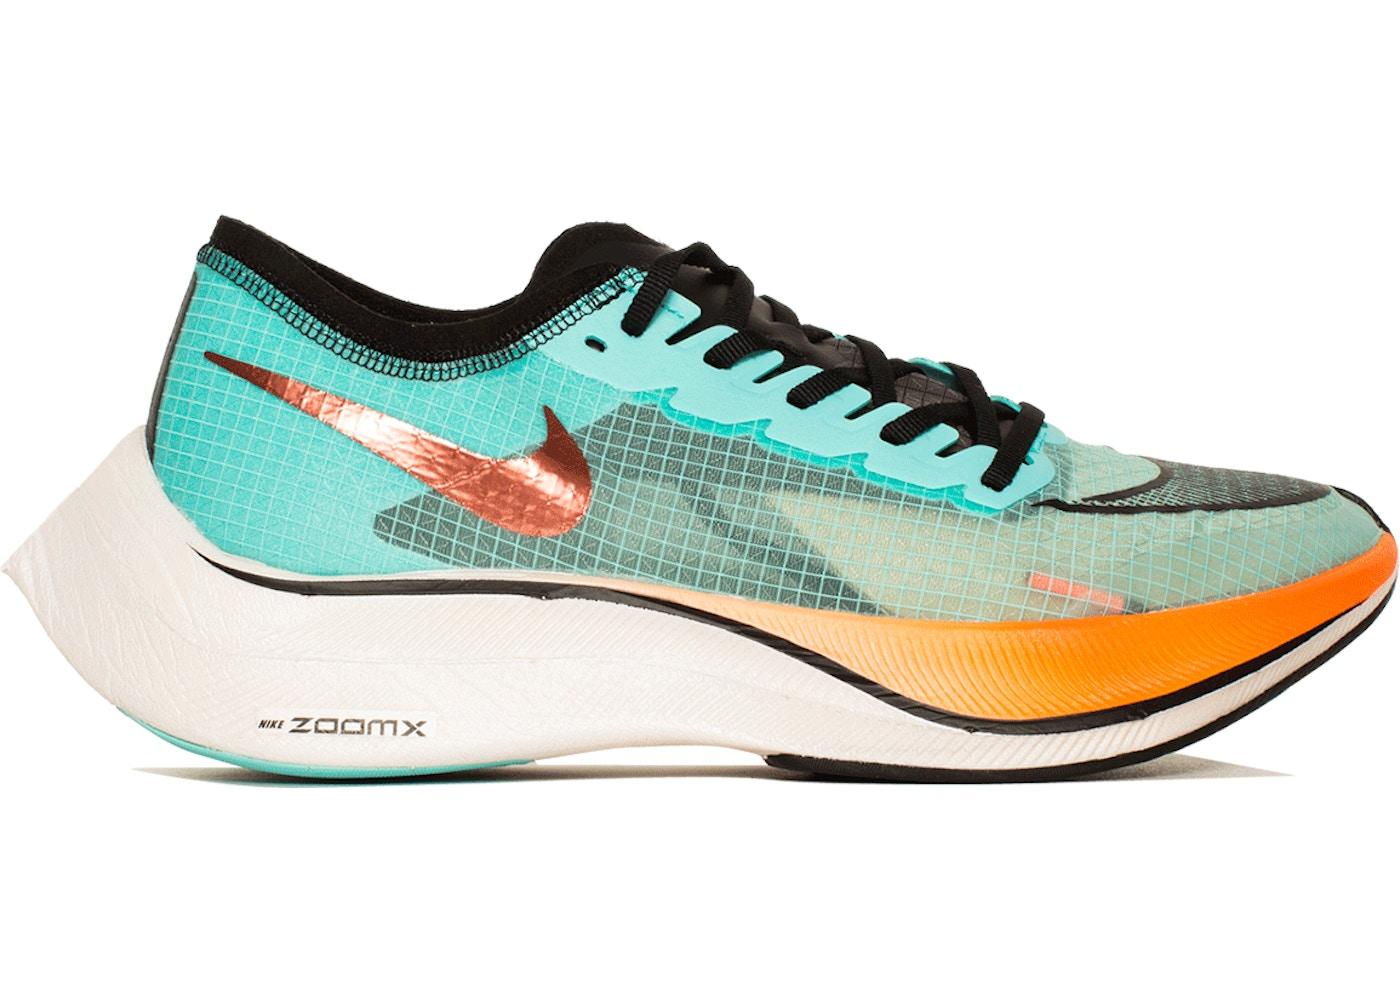 Nike Zoom Vaporfly Next Ekiden Cd4553 300